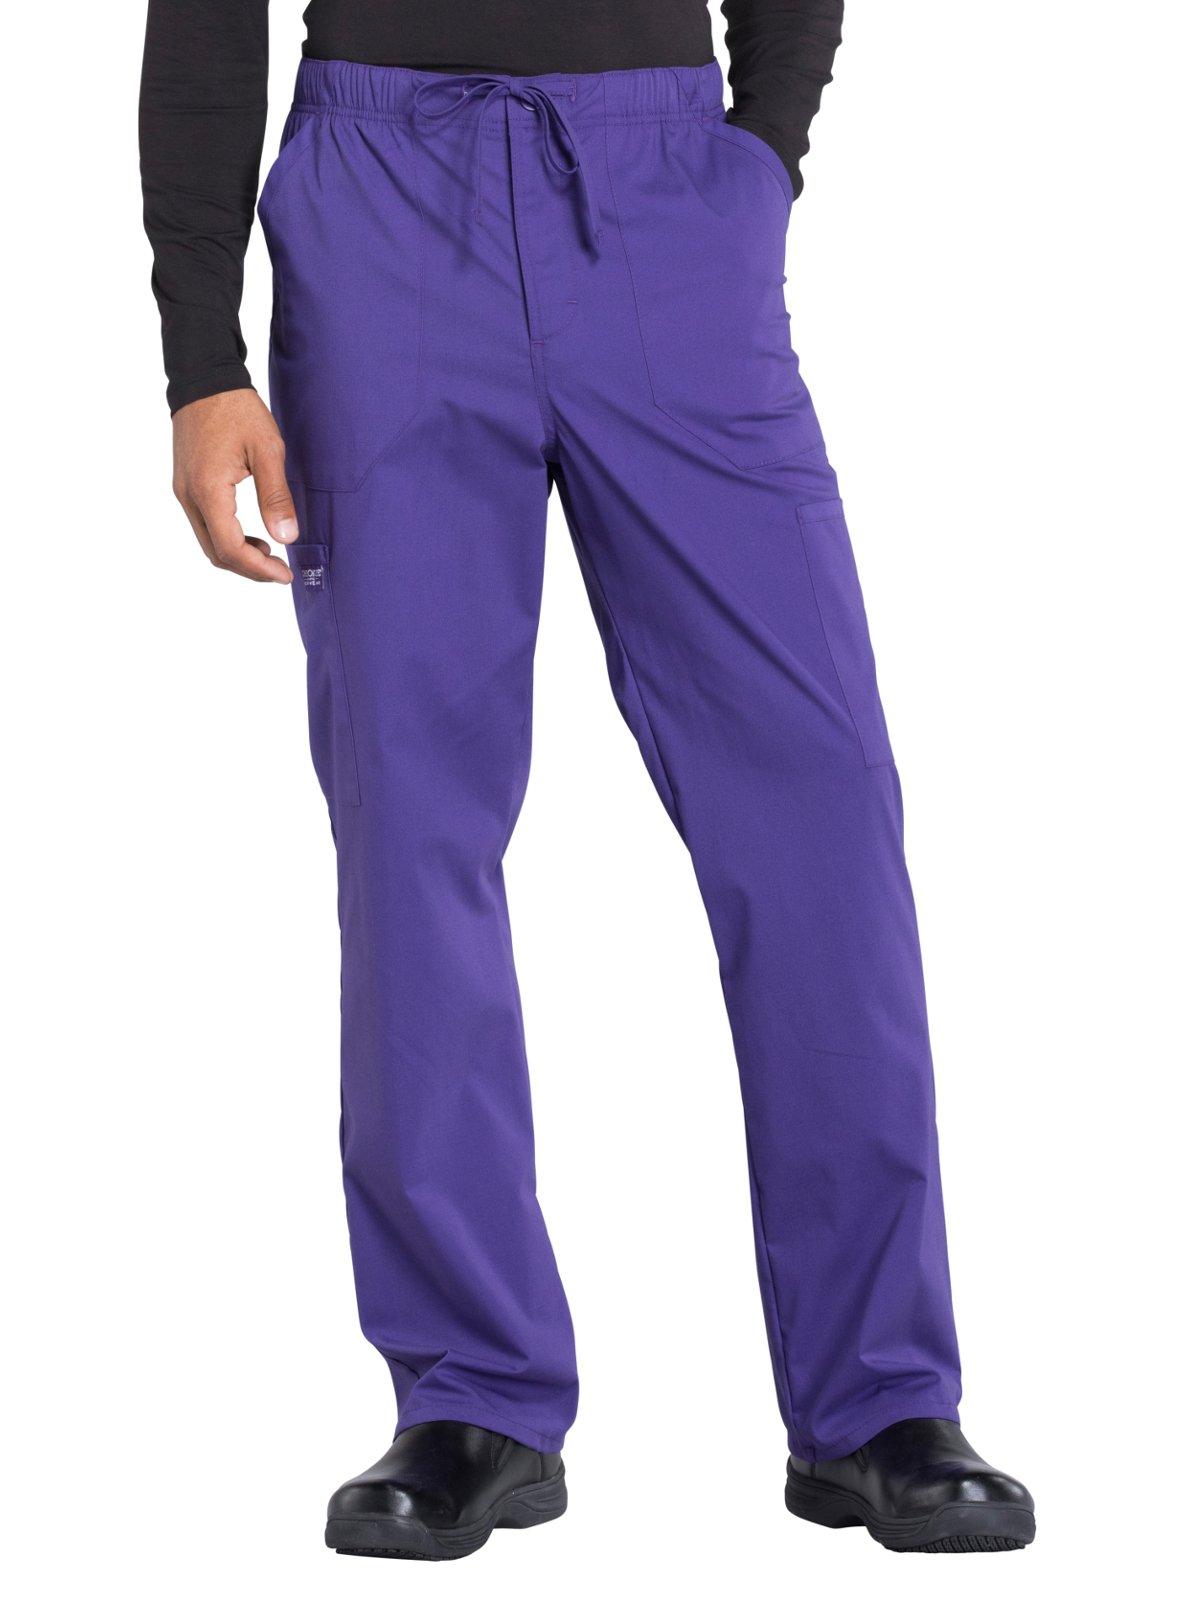 Cherokee Professionals Workwear Men's Tapered Leg Zip Fly Drawstring Scrub Pant X-Large Grape